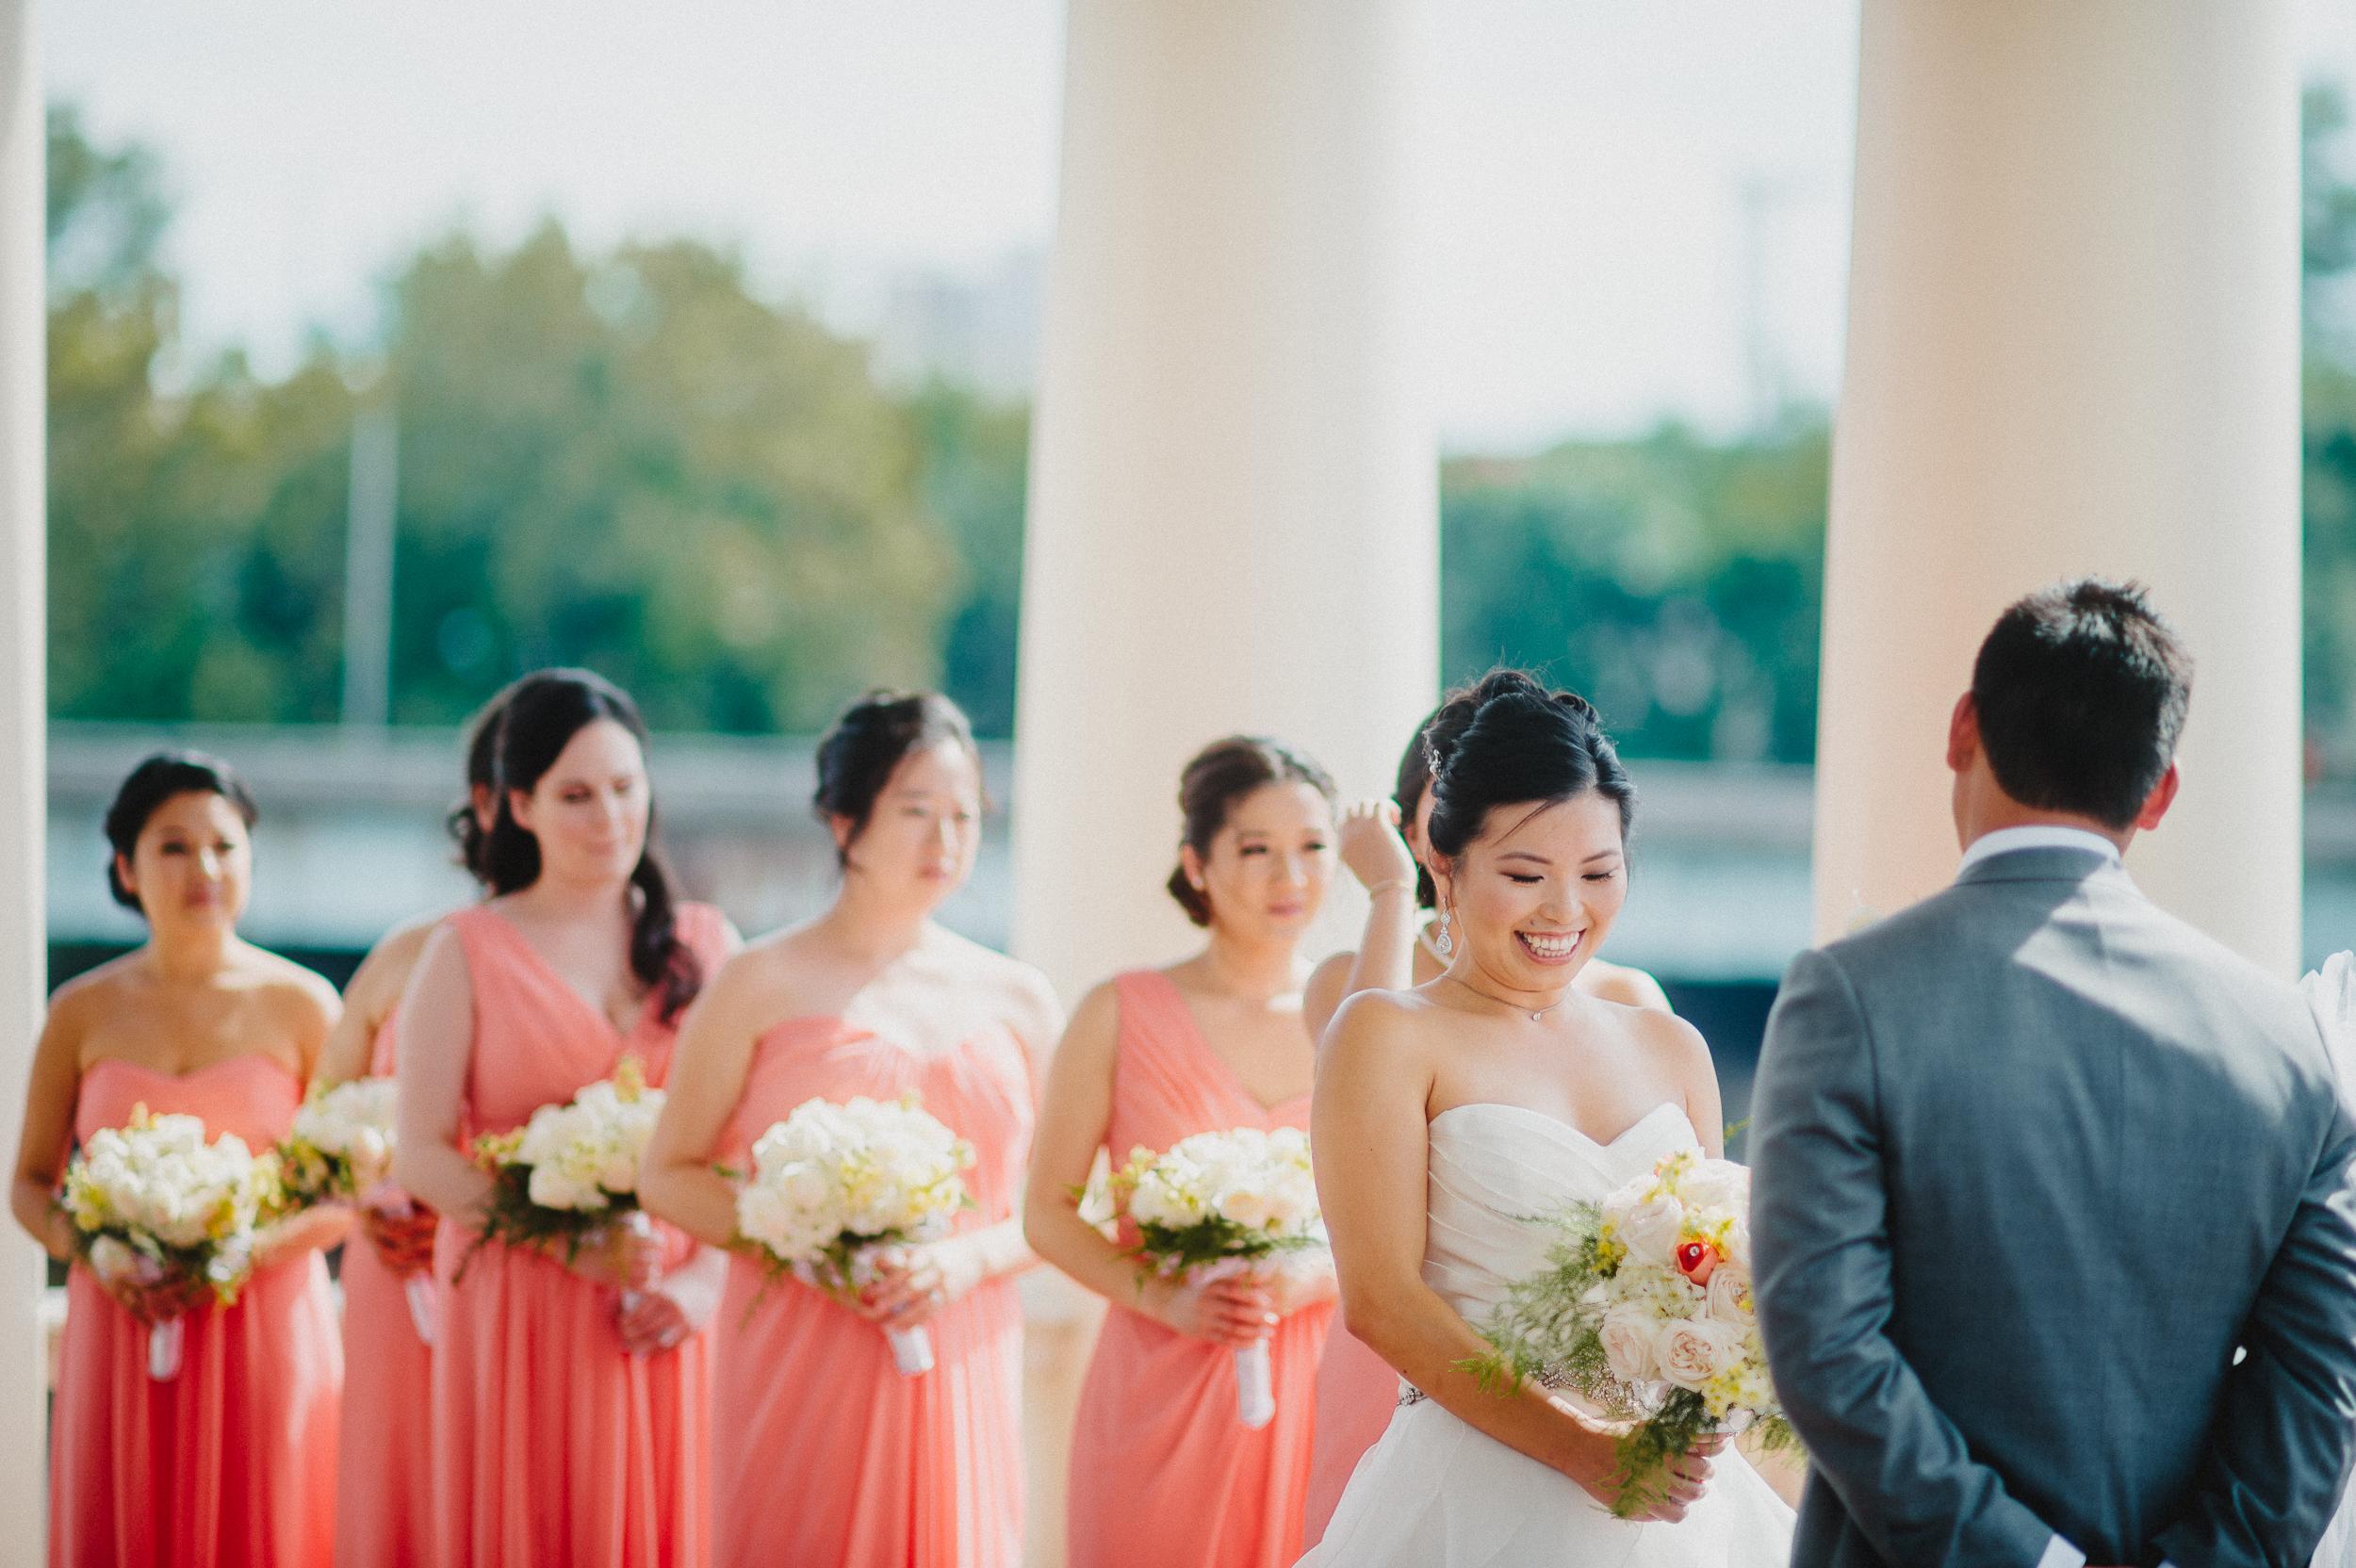 union-trust-philadelphia-wedding-photographer-42.jpg